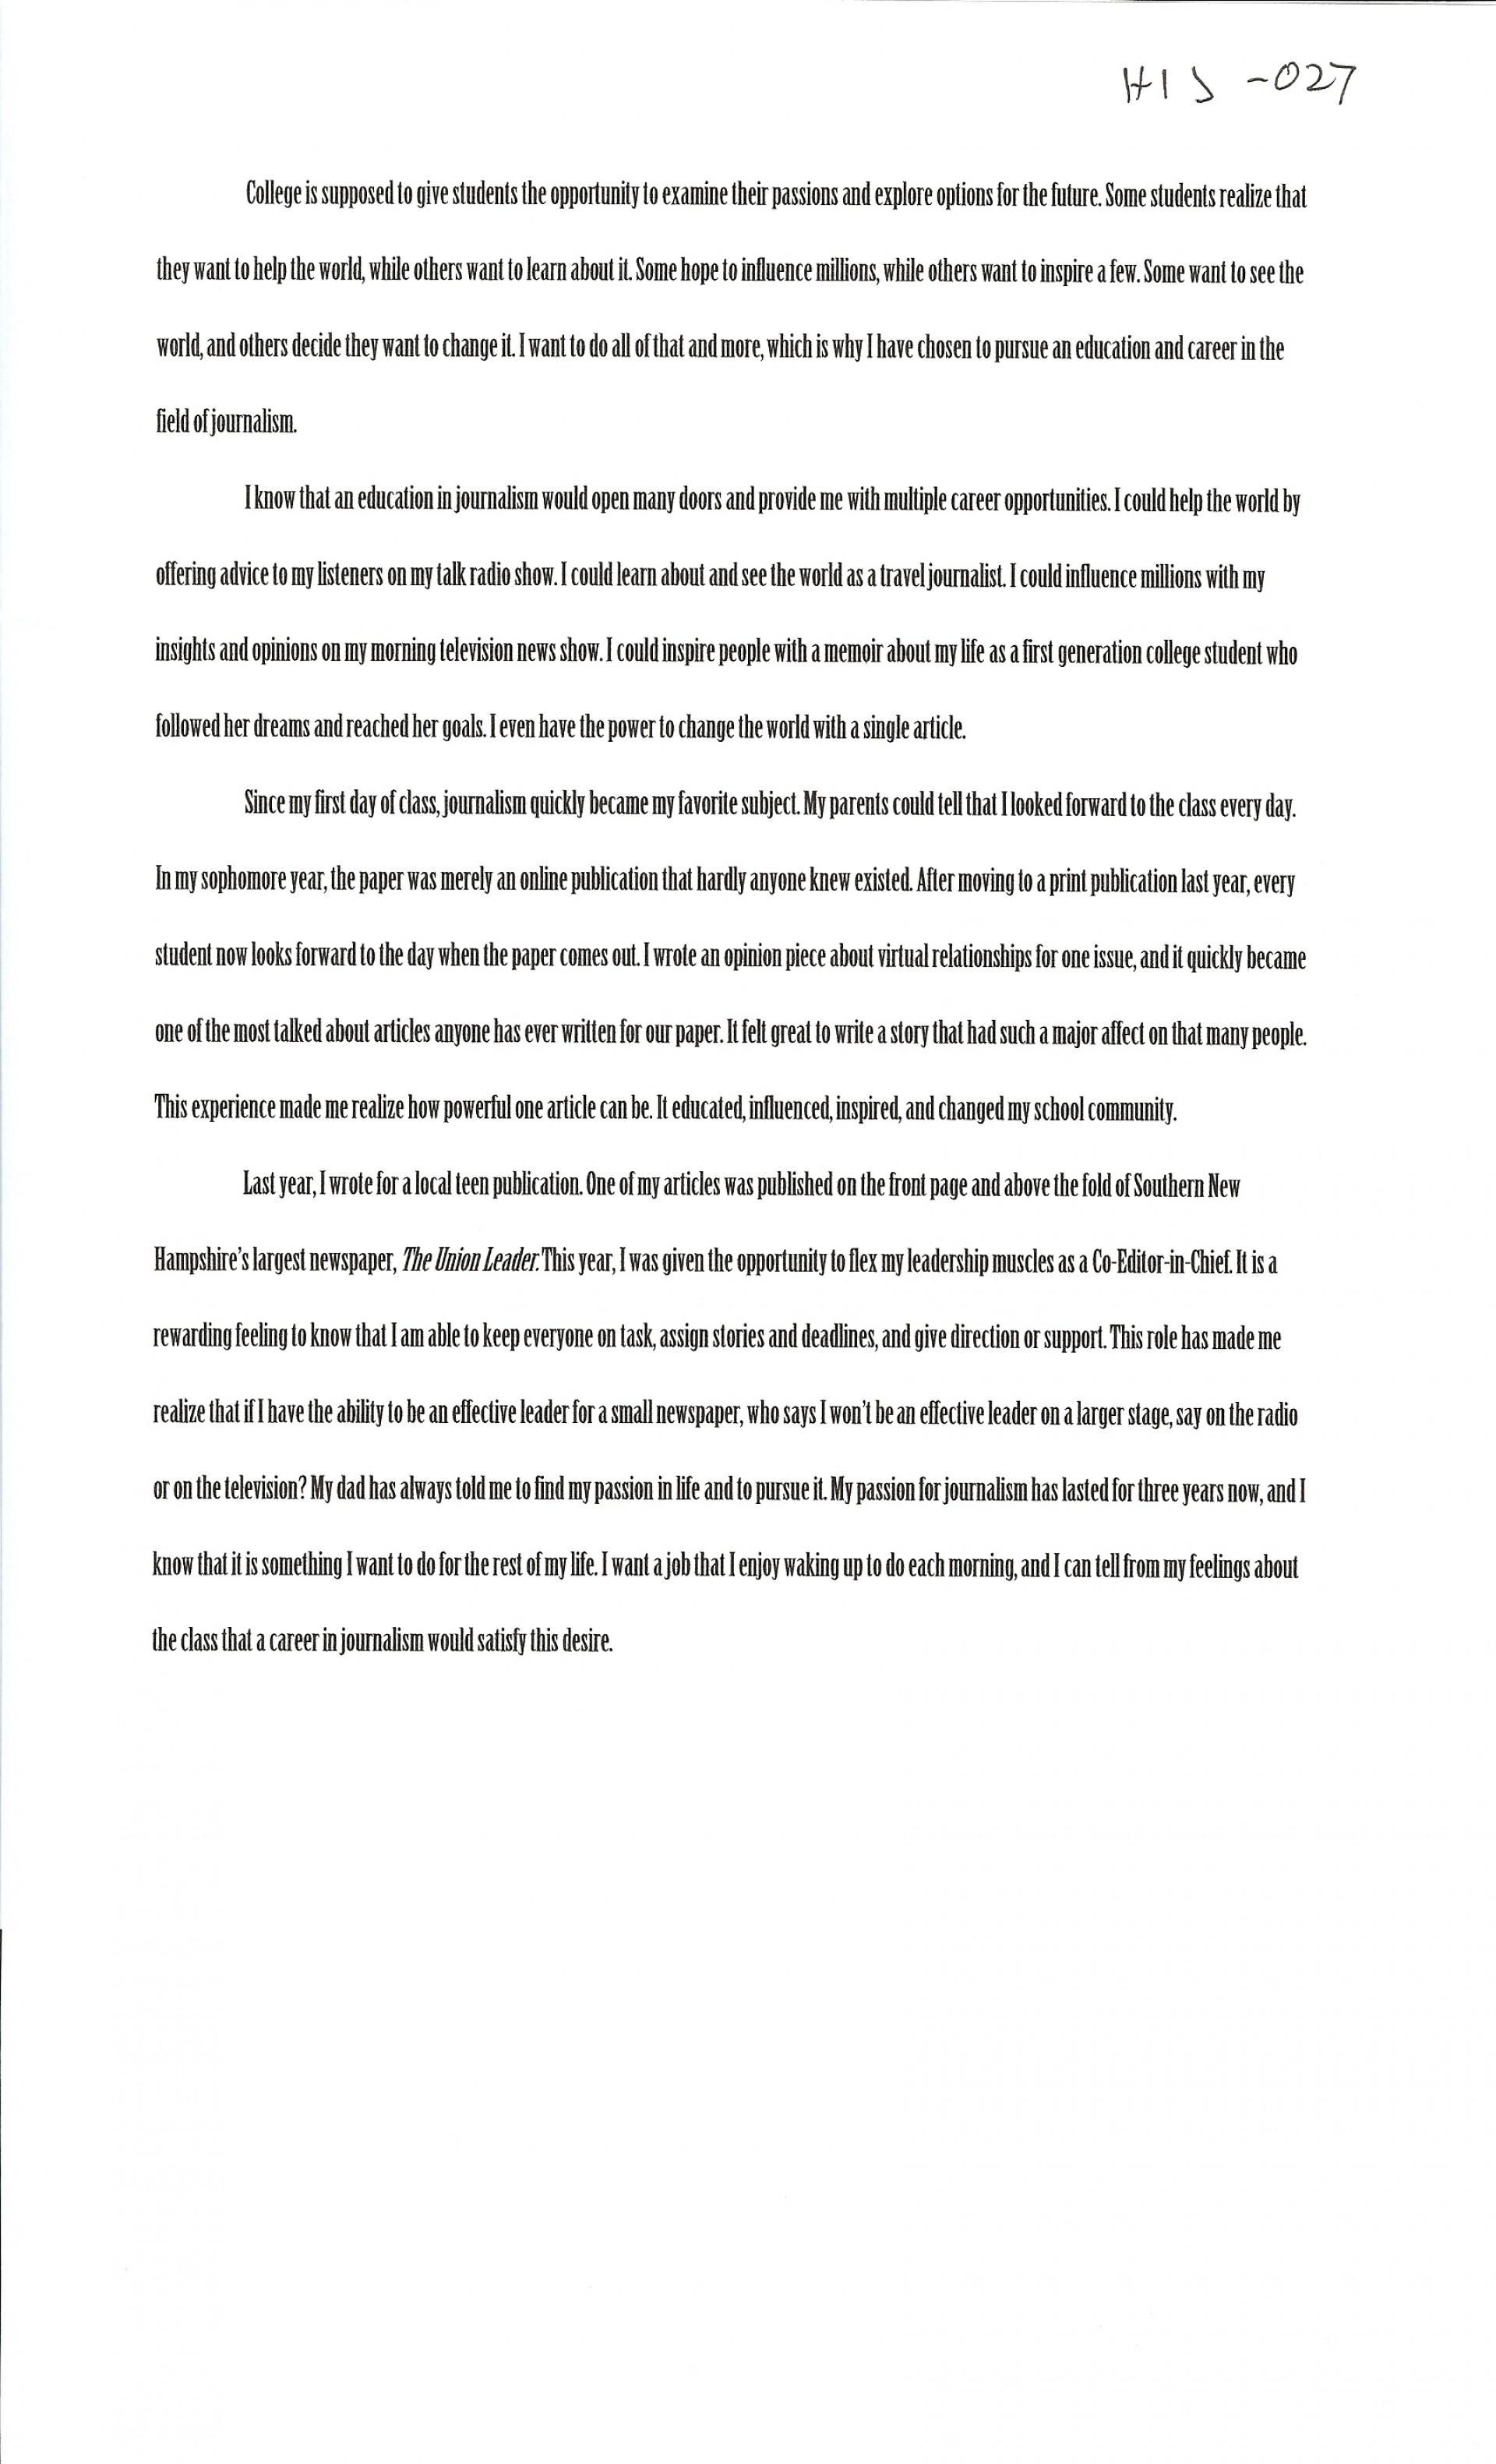 013 Alexa Serrecchia Essays Of Profile Marvelous Examples College Community Company 1920